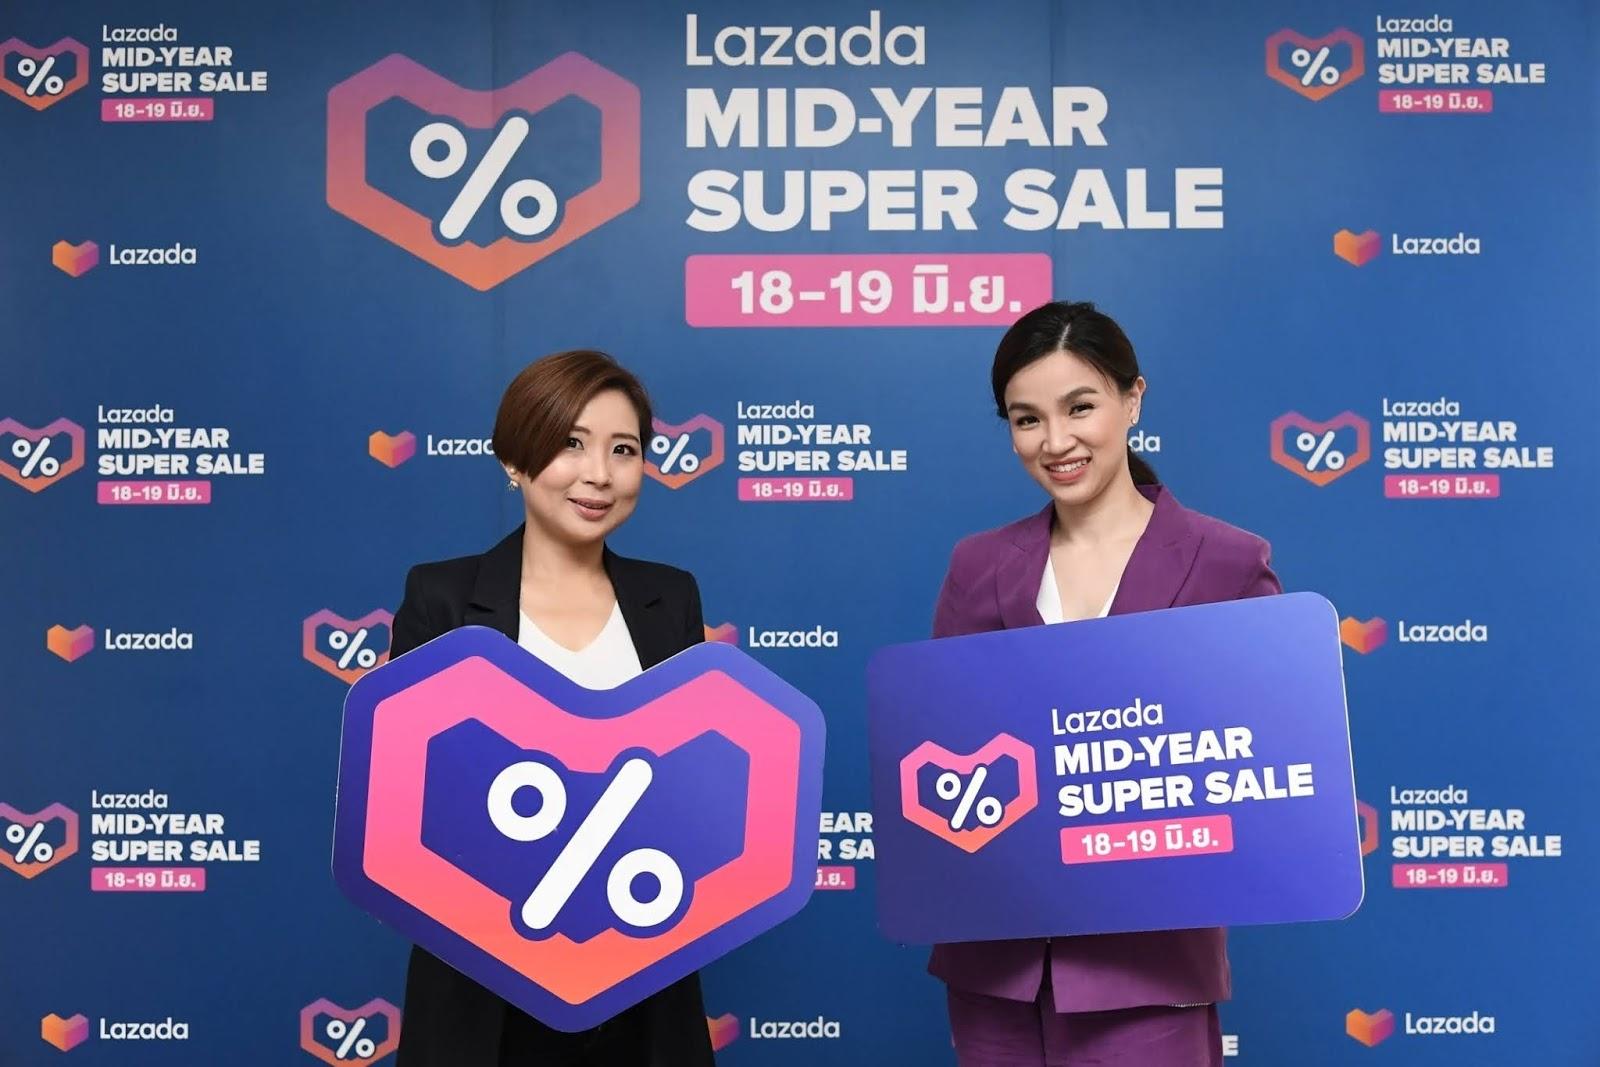 Lazada เผยความสำเร็จ Mid-Year Super Live Grand Showท่วมท้นด้วยยอดผู้ชมกว่า 4 แสนราย พร้อมผู้ขายและ KOL ร่วมสร้างสีสันกว่า 1,000 ราย